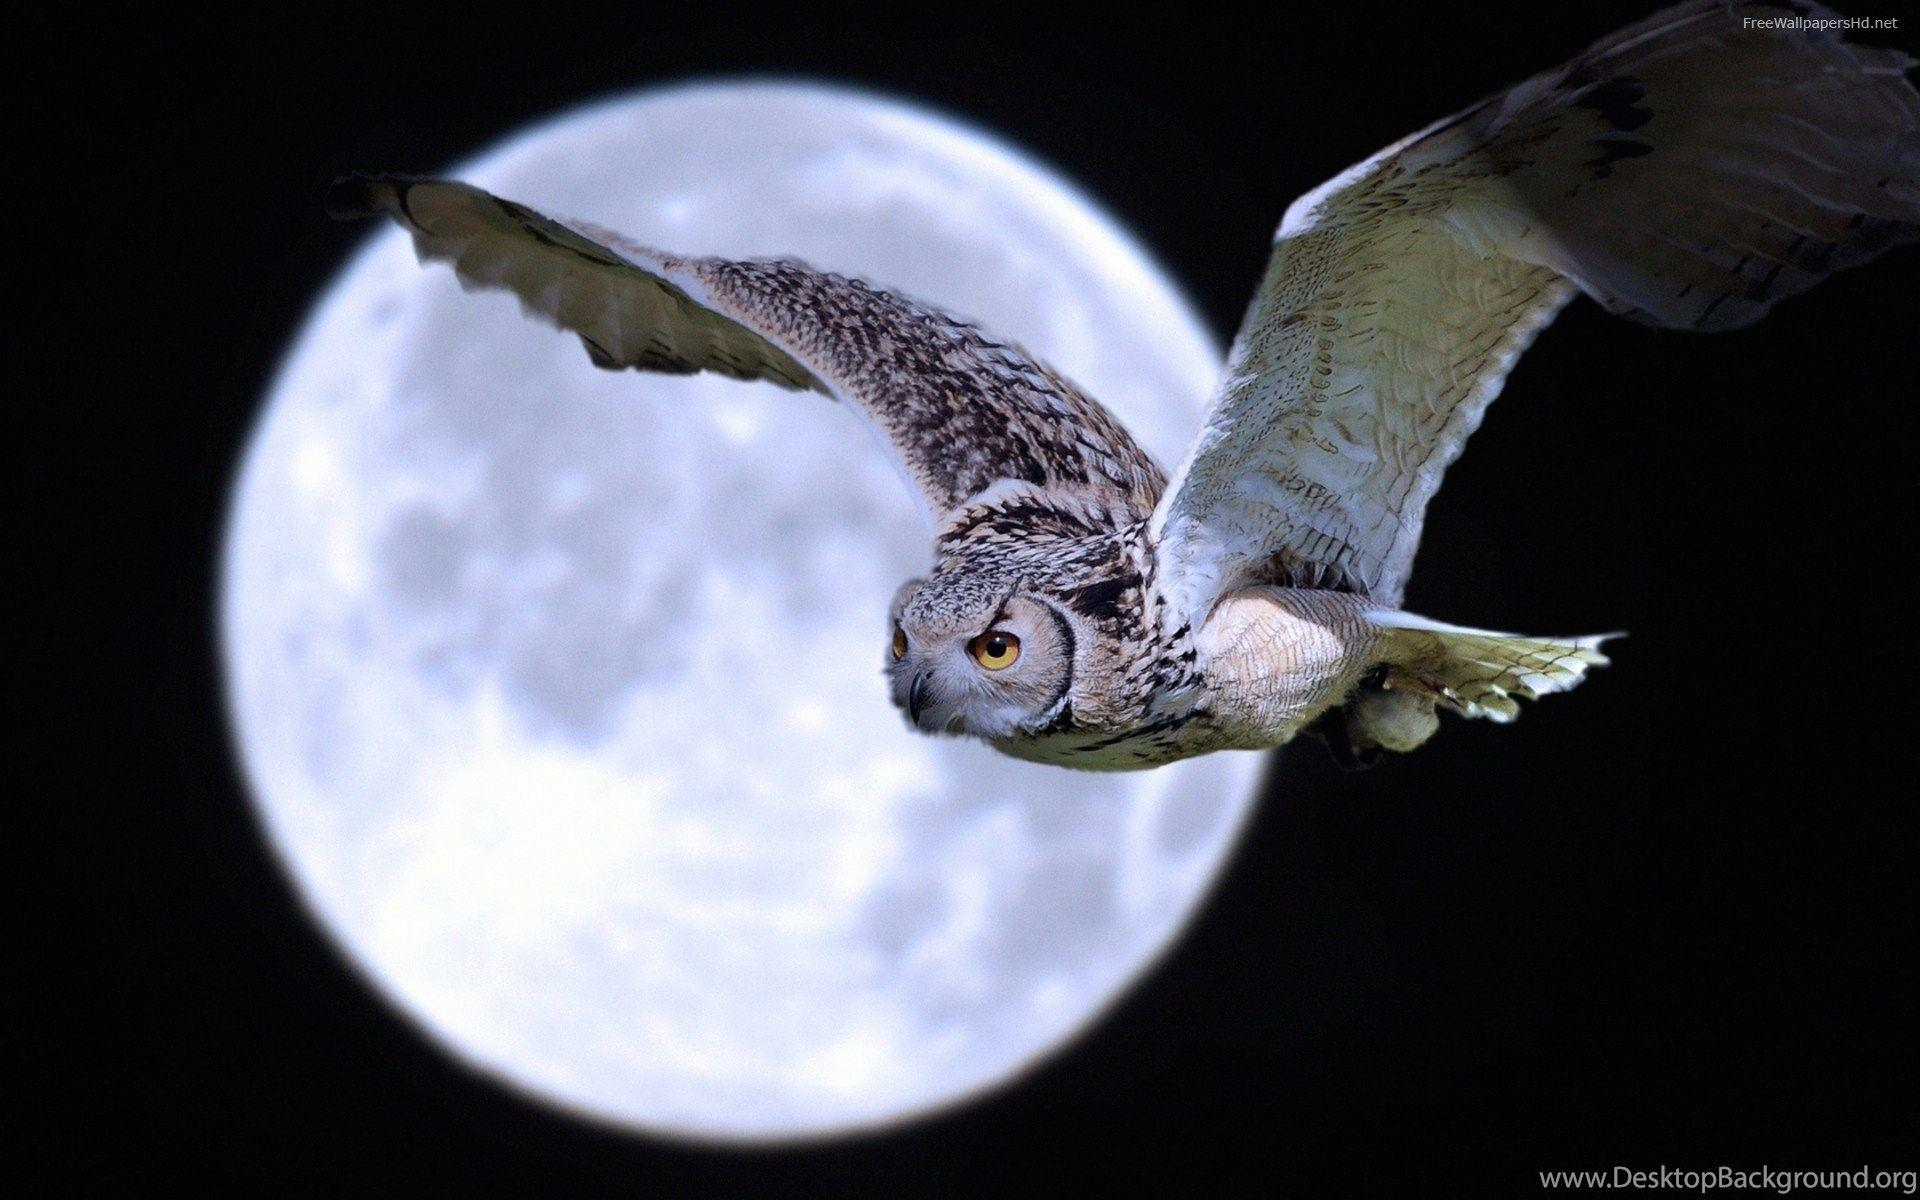 Unduh 6800 Wallpaper Animasi Burung Gambar Paling Keren